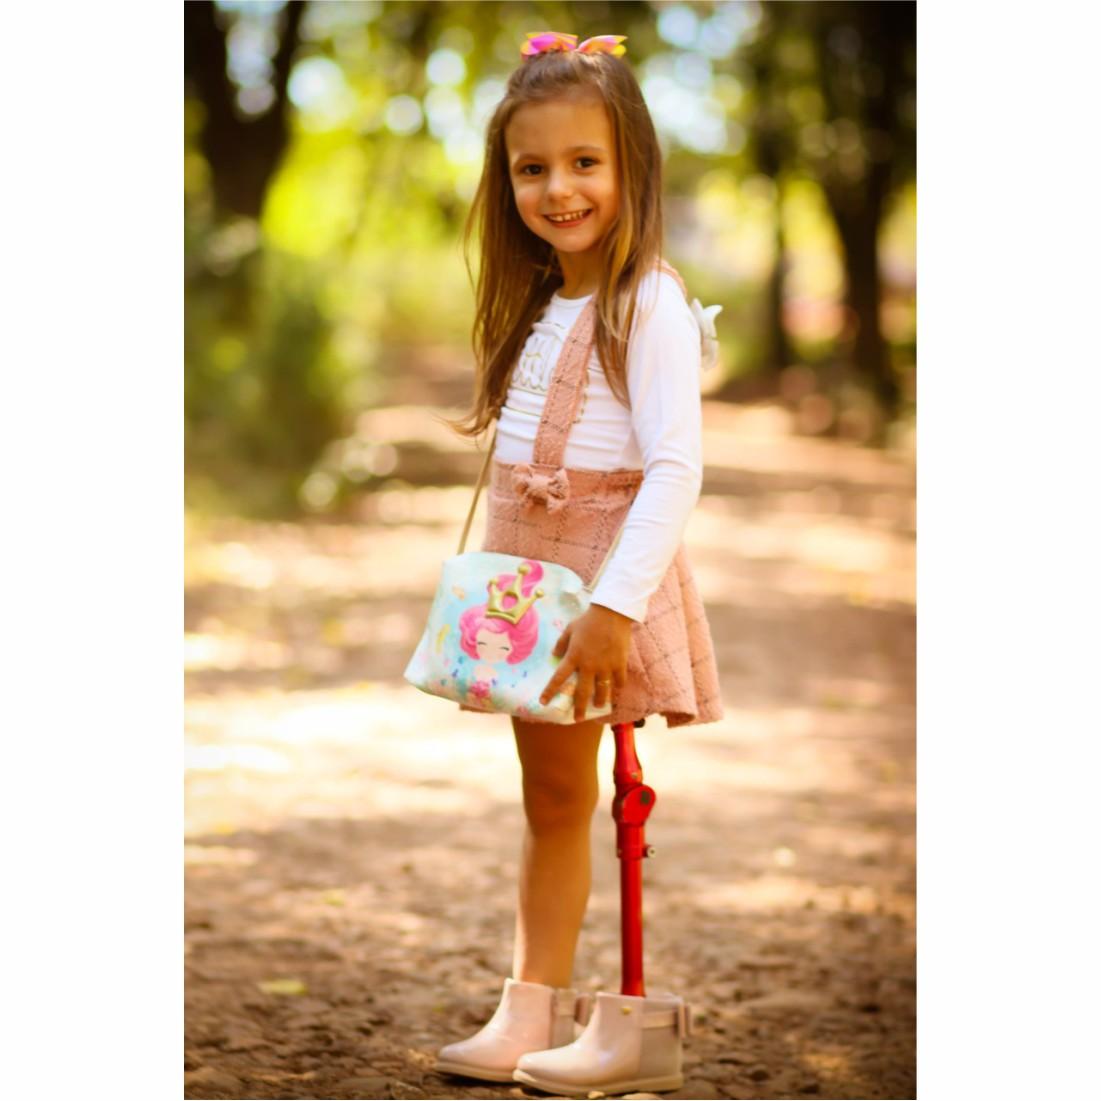 Bolsa Infantil Sereia Com Coroa Dourada, Magicc